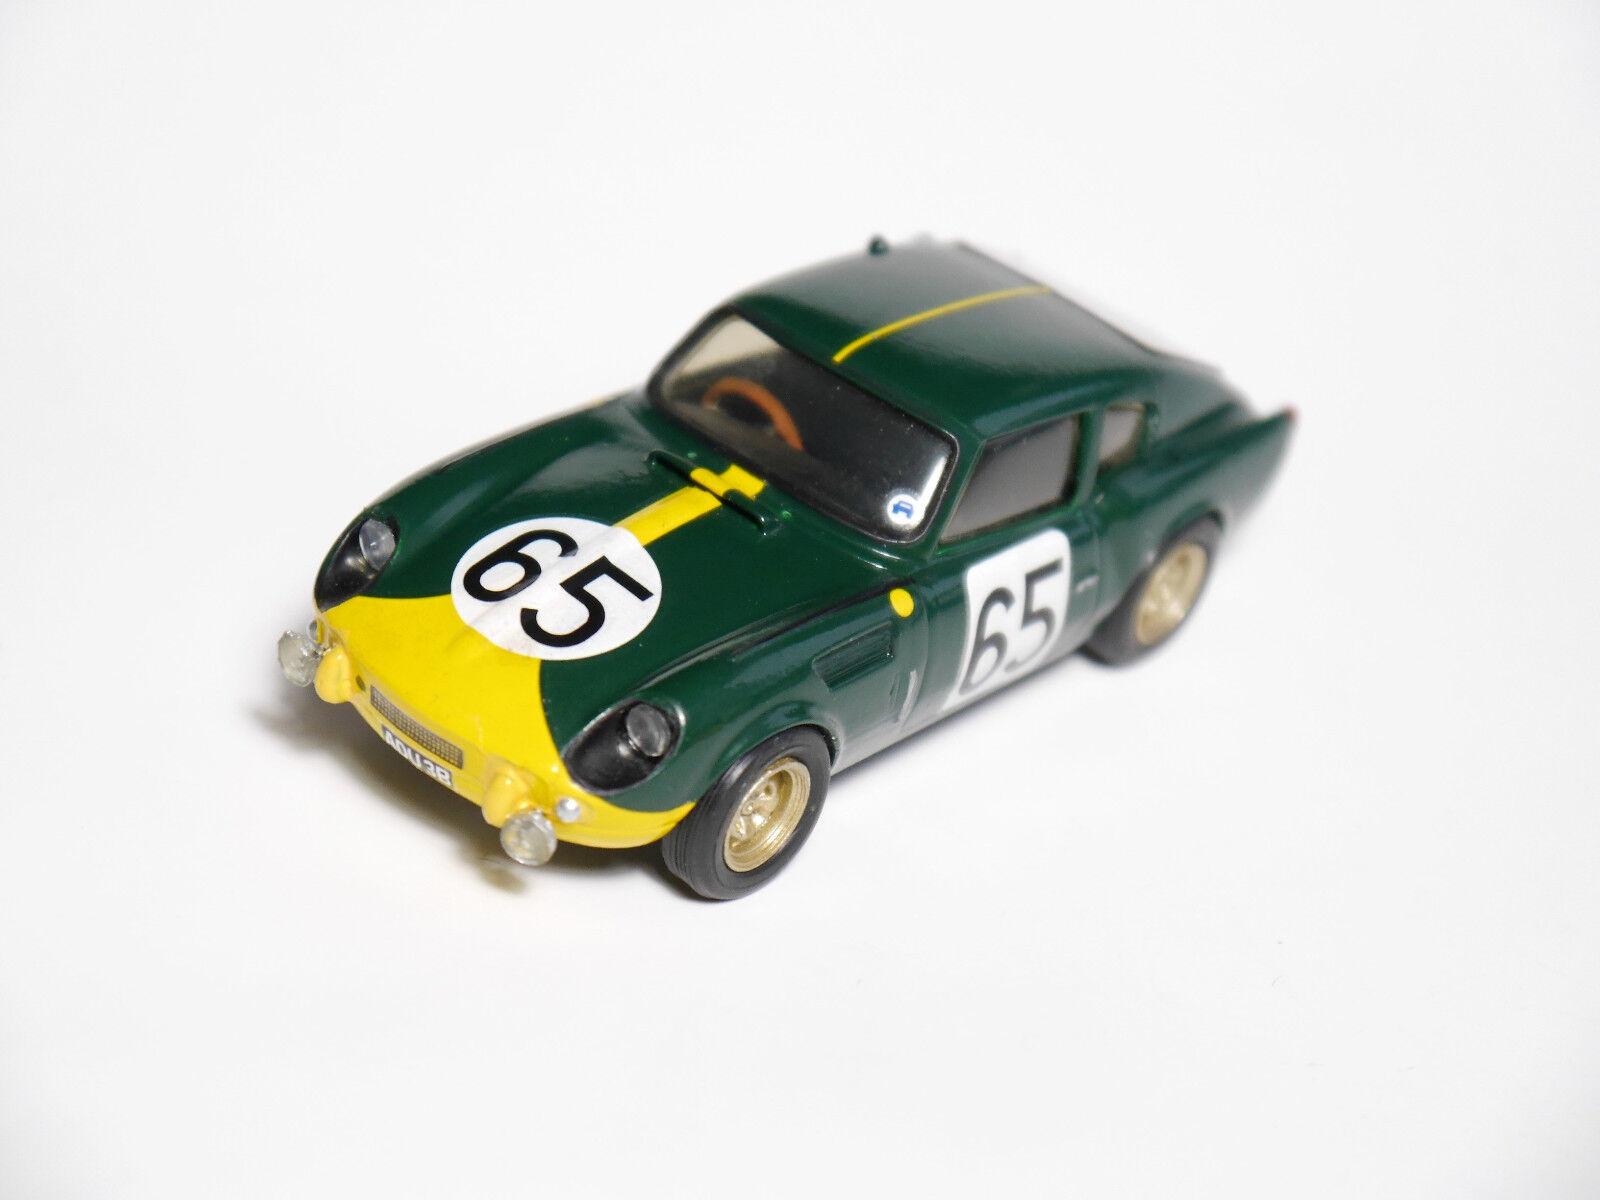 TRIUMPH Spitfire  ADU 3 B  Le Mans, fatto a mano handmade/Provence Moulage 1:43